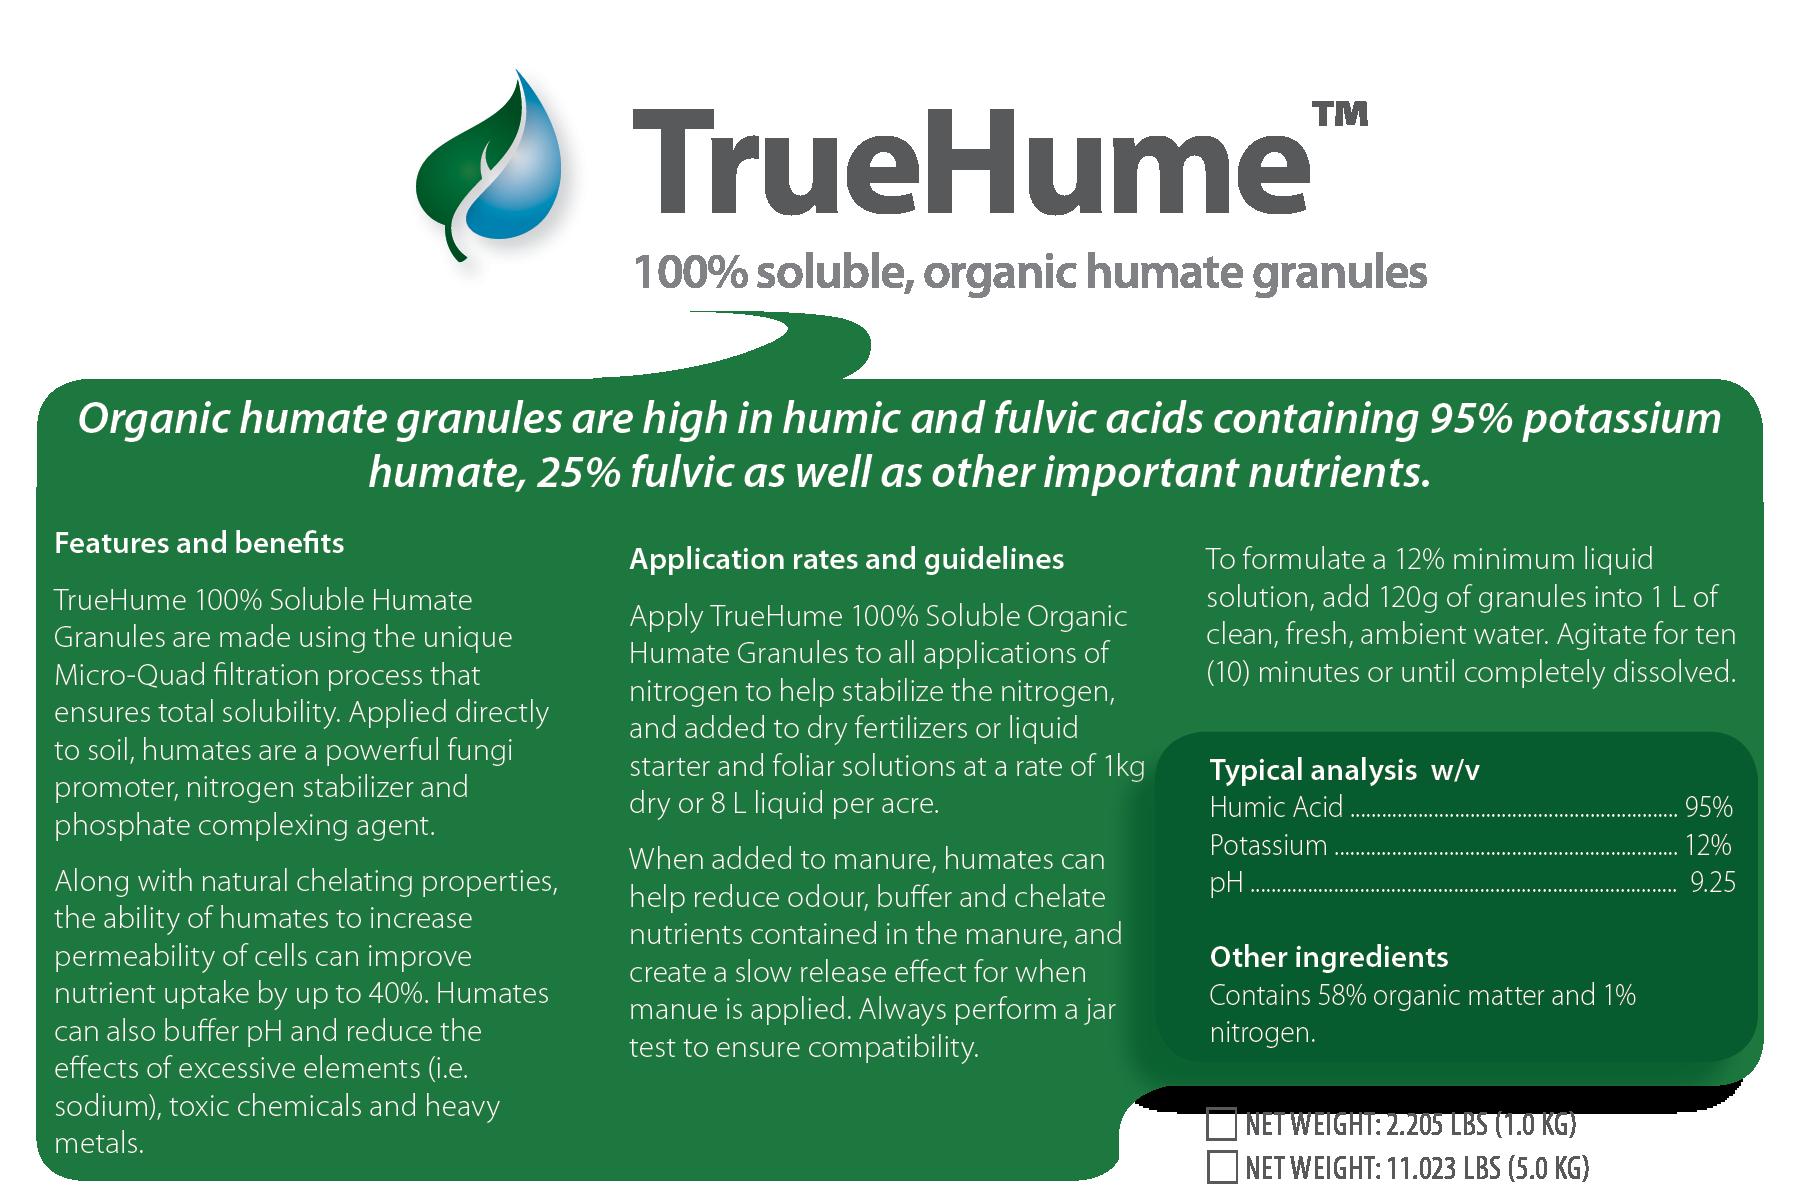 TrueHume Organic Soluble Humate Granules